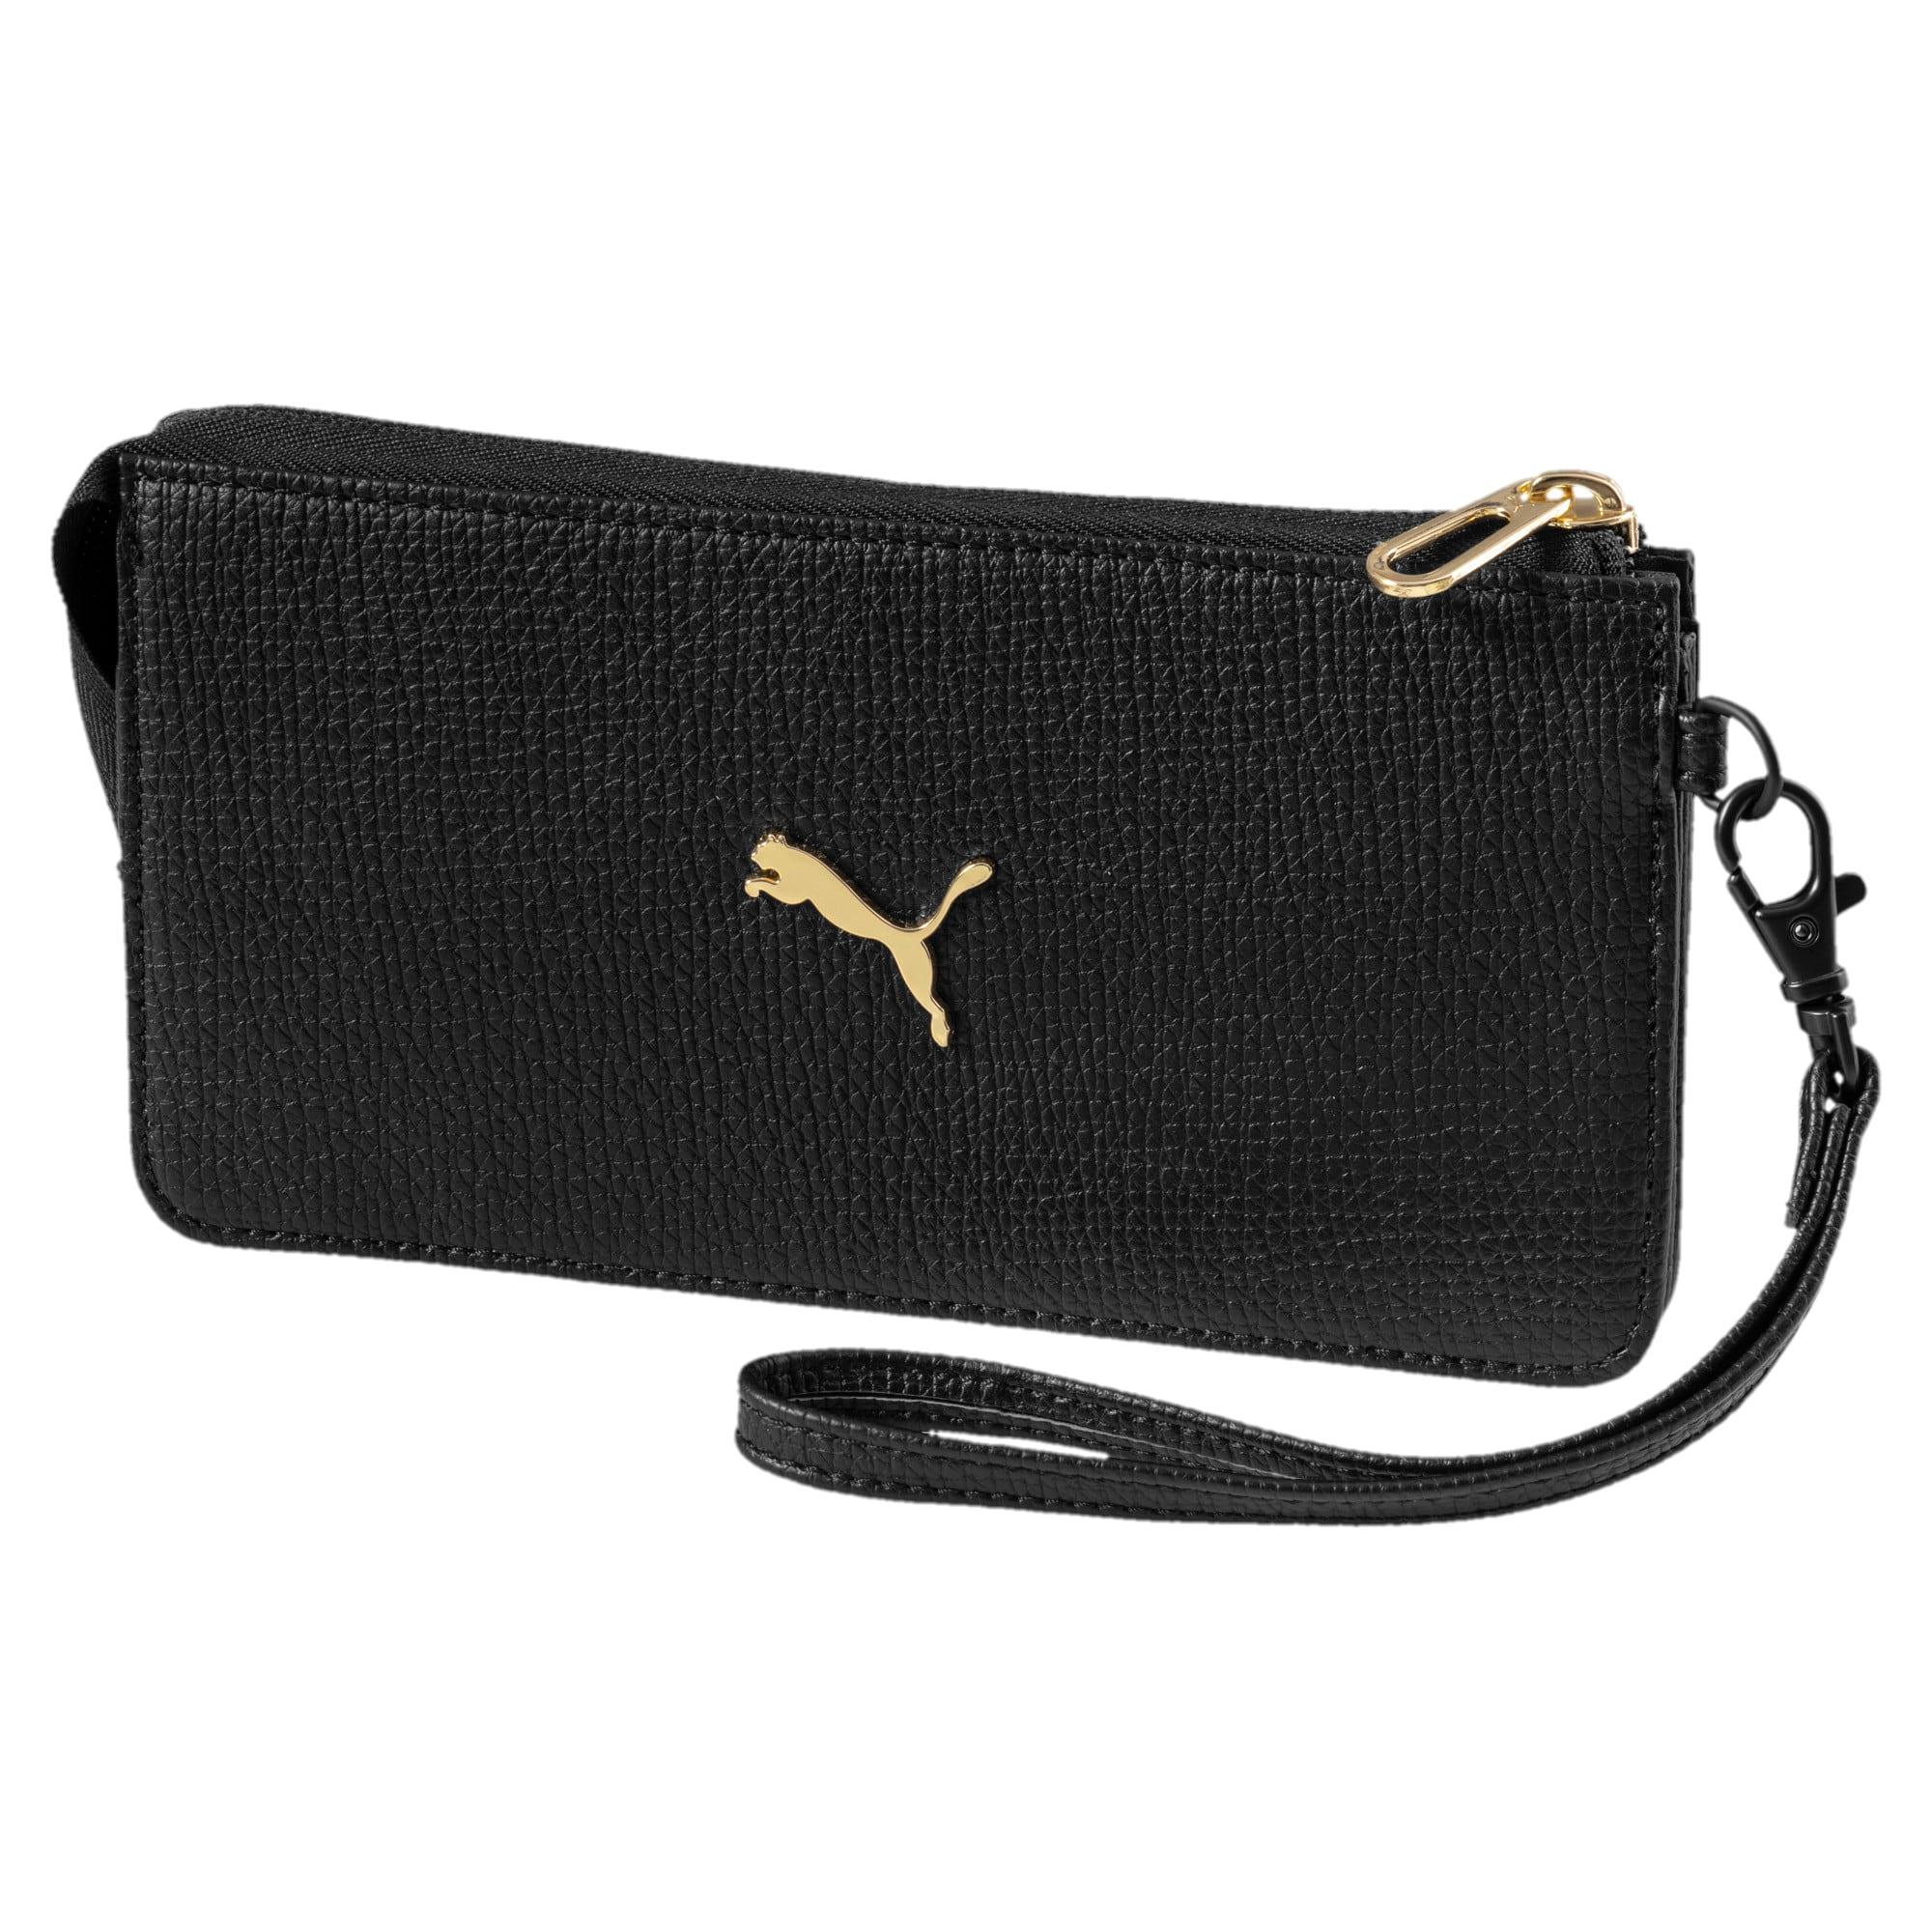 Anteprima 2 di Ferrari Lifestyle Women's Wallet, Puma Black, medio